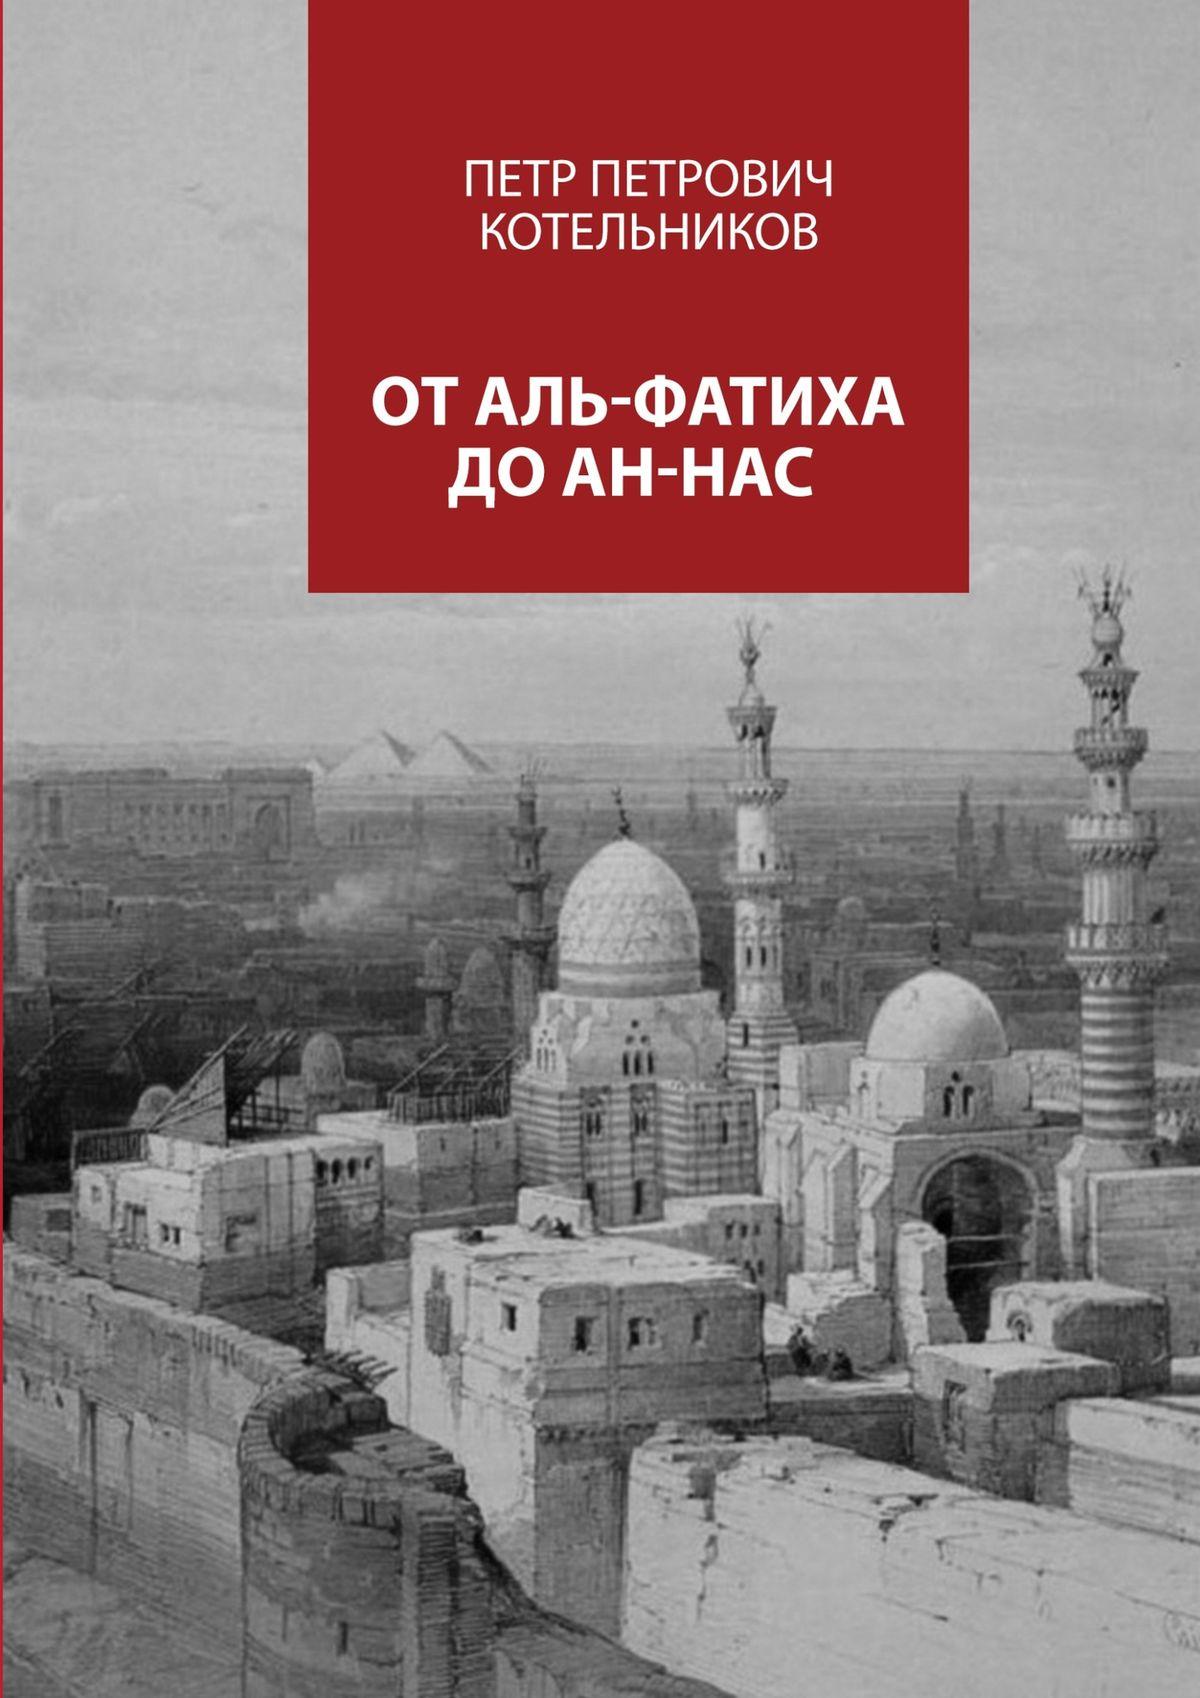 ОтАль-Фатиха доАн-Нас